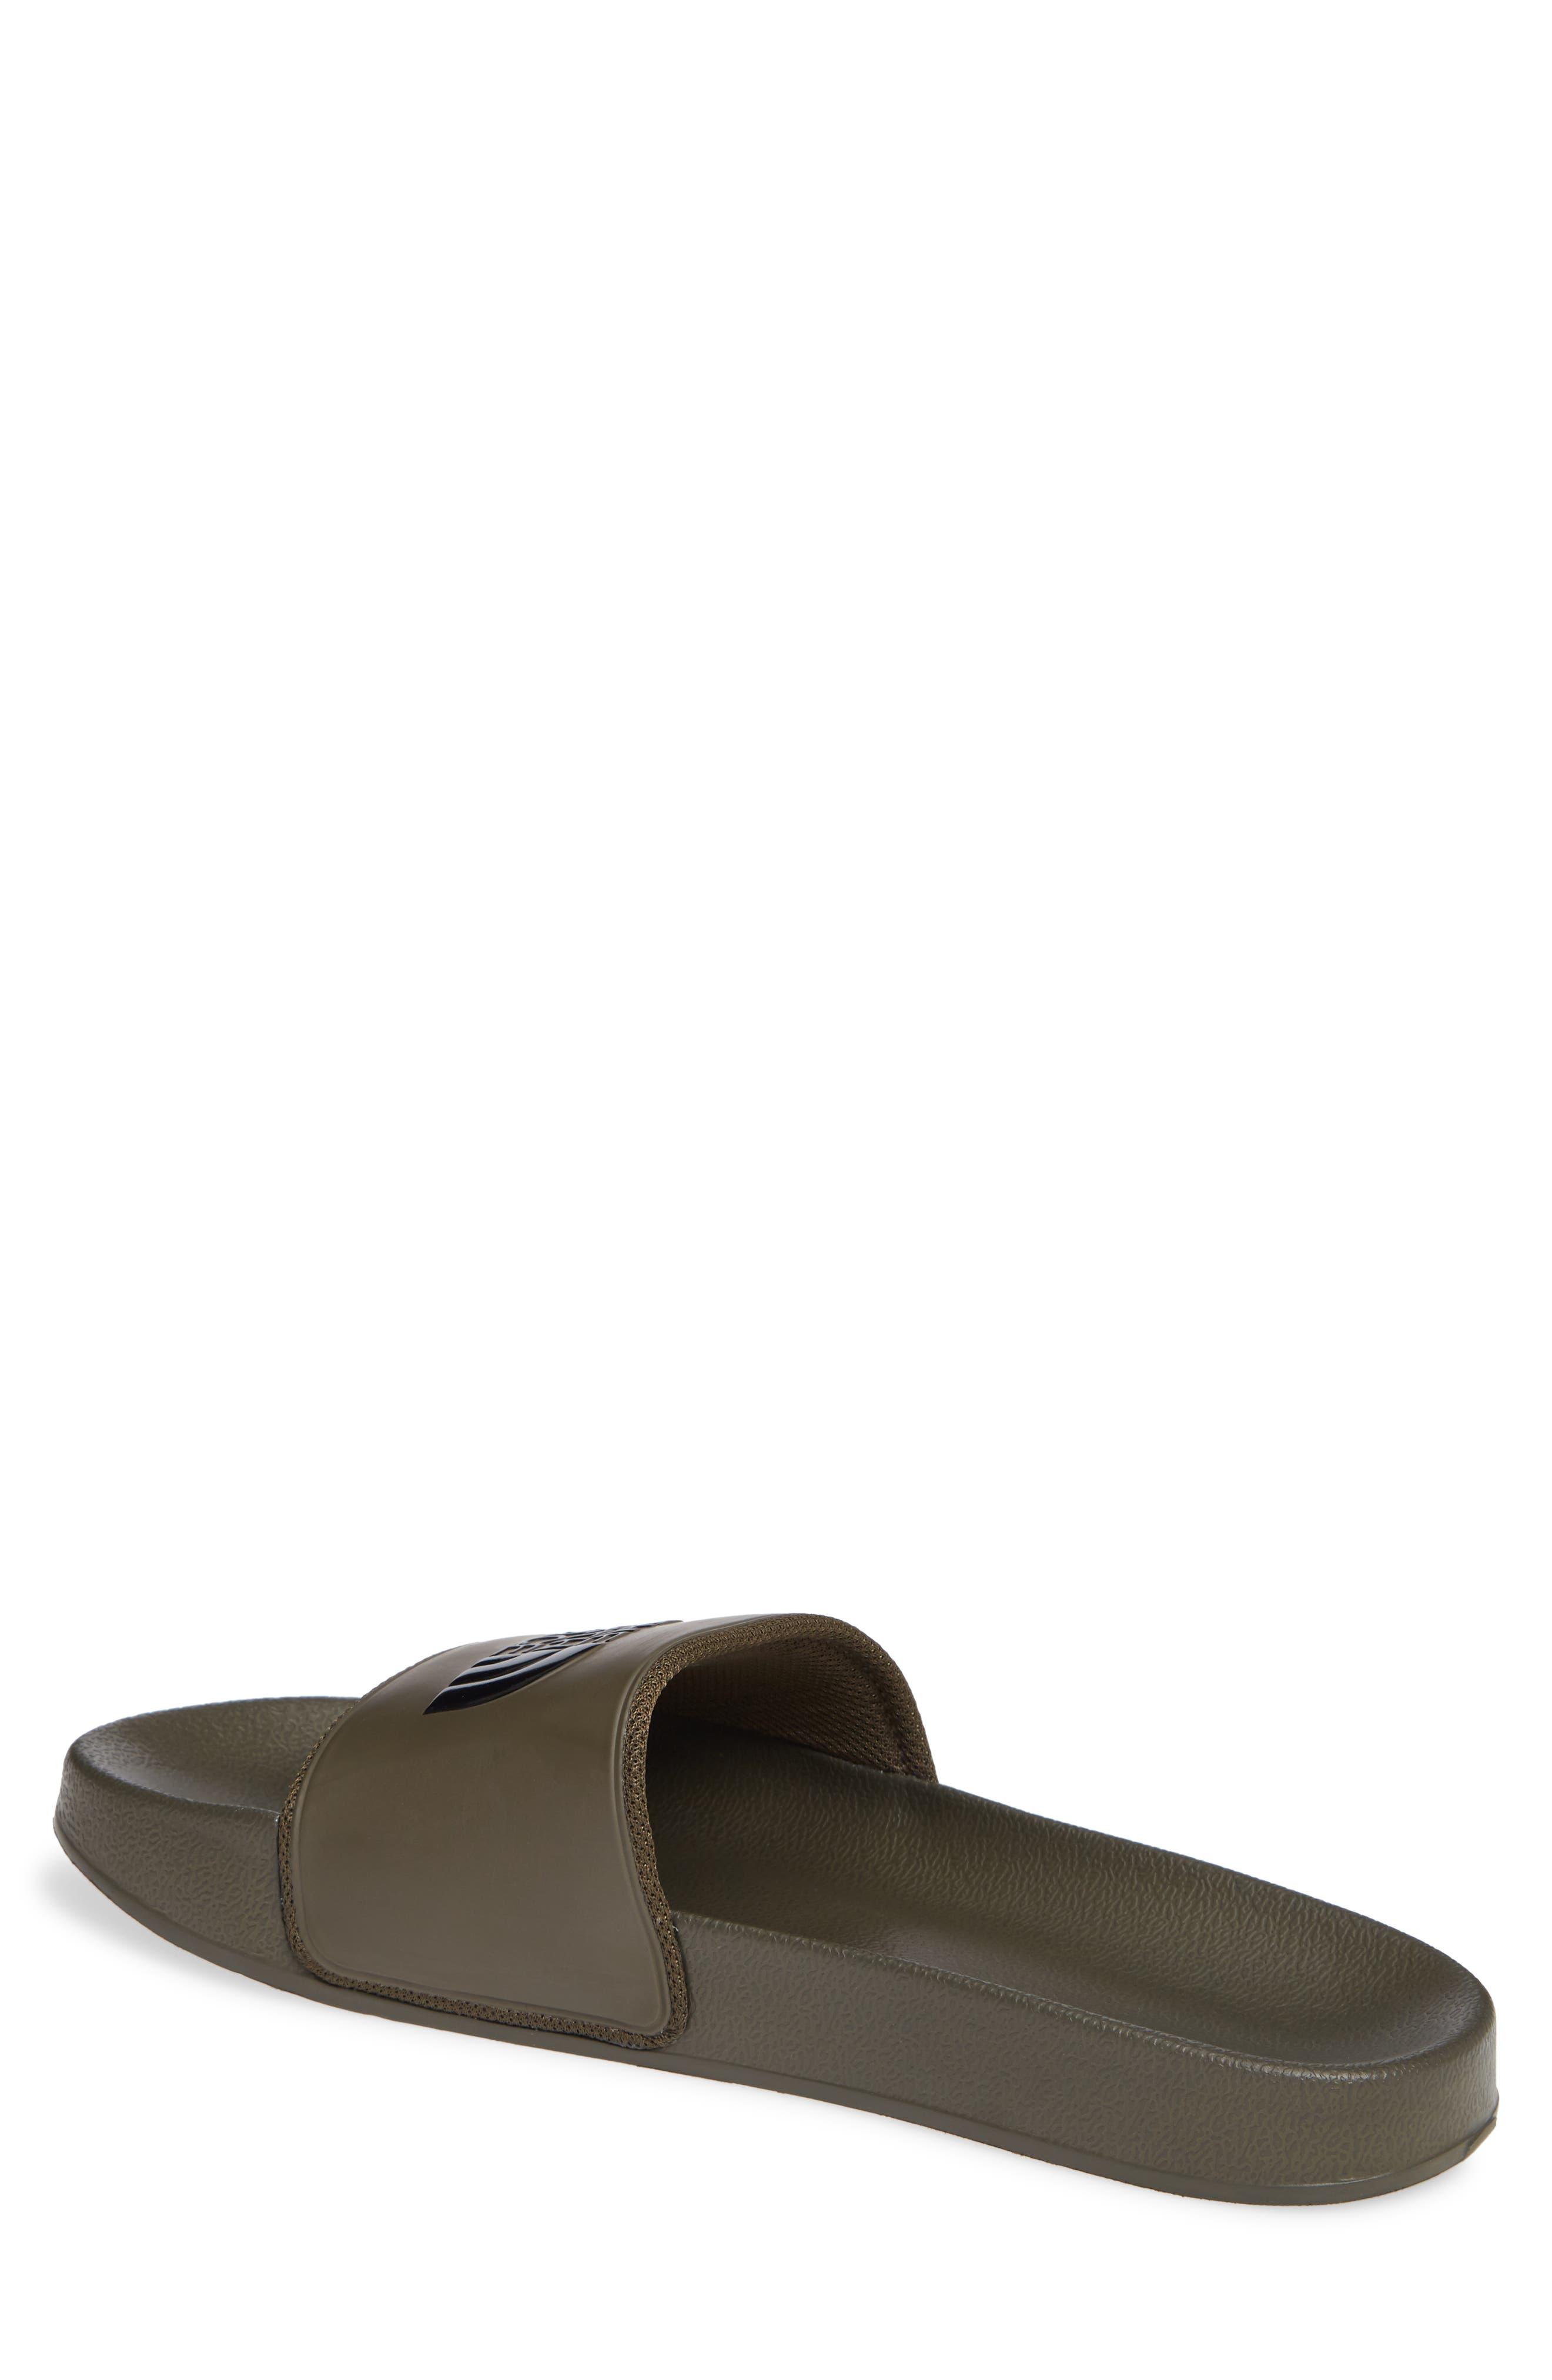 Base Camp II Slide Sandal,                             Alternate thumbnail 2, color,                             TARMAC GREEN/ BLACK